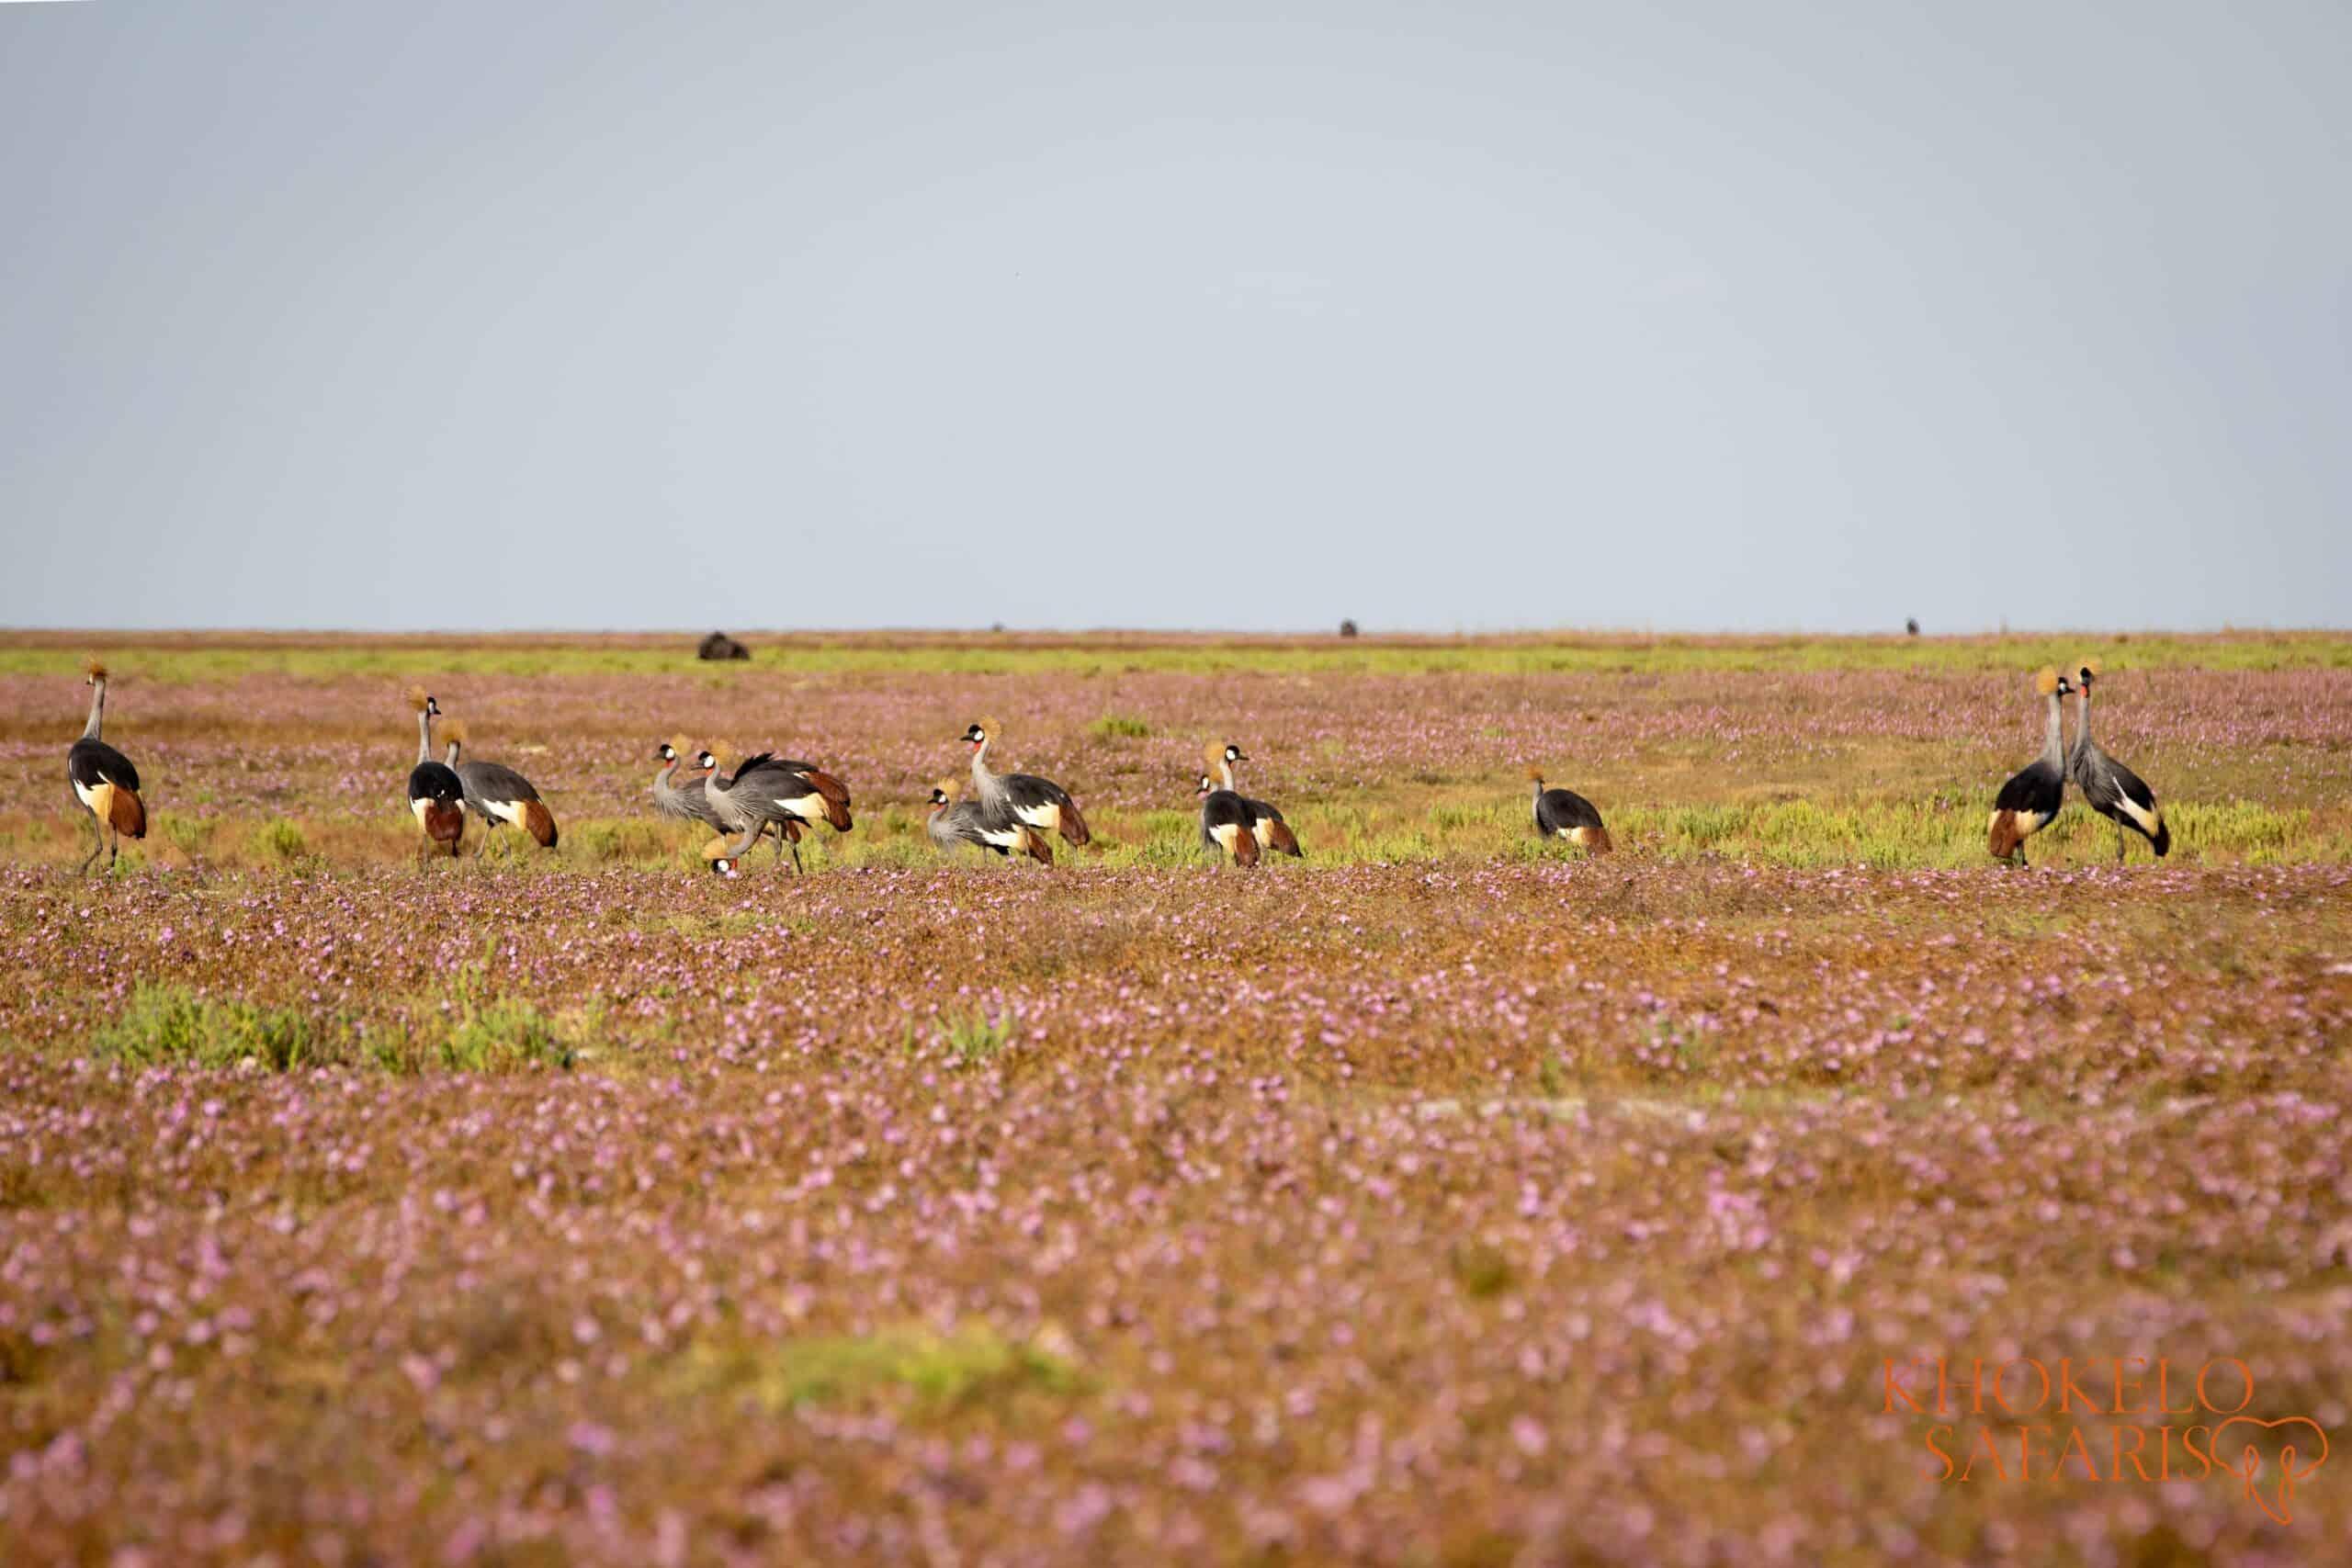 crested cranes in Liuwa Plain selfdrive Zambia